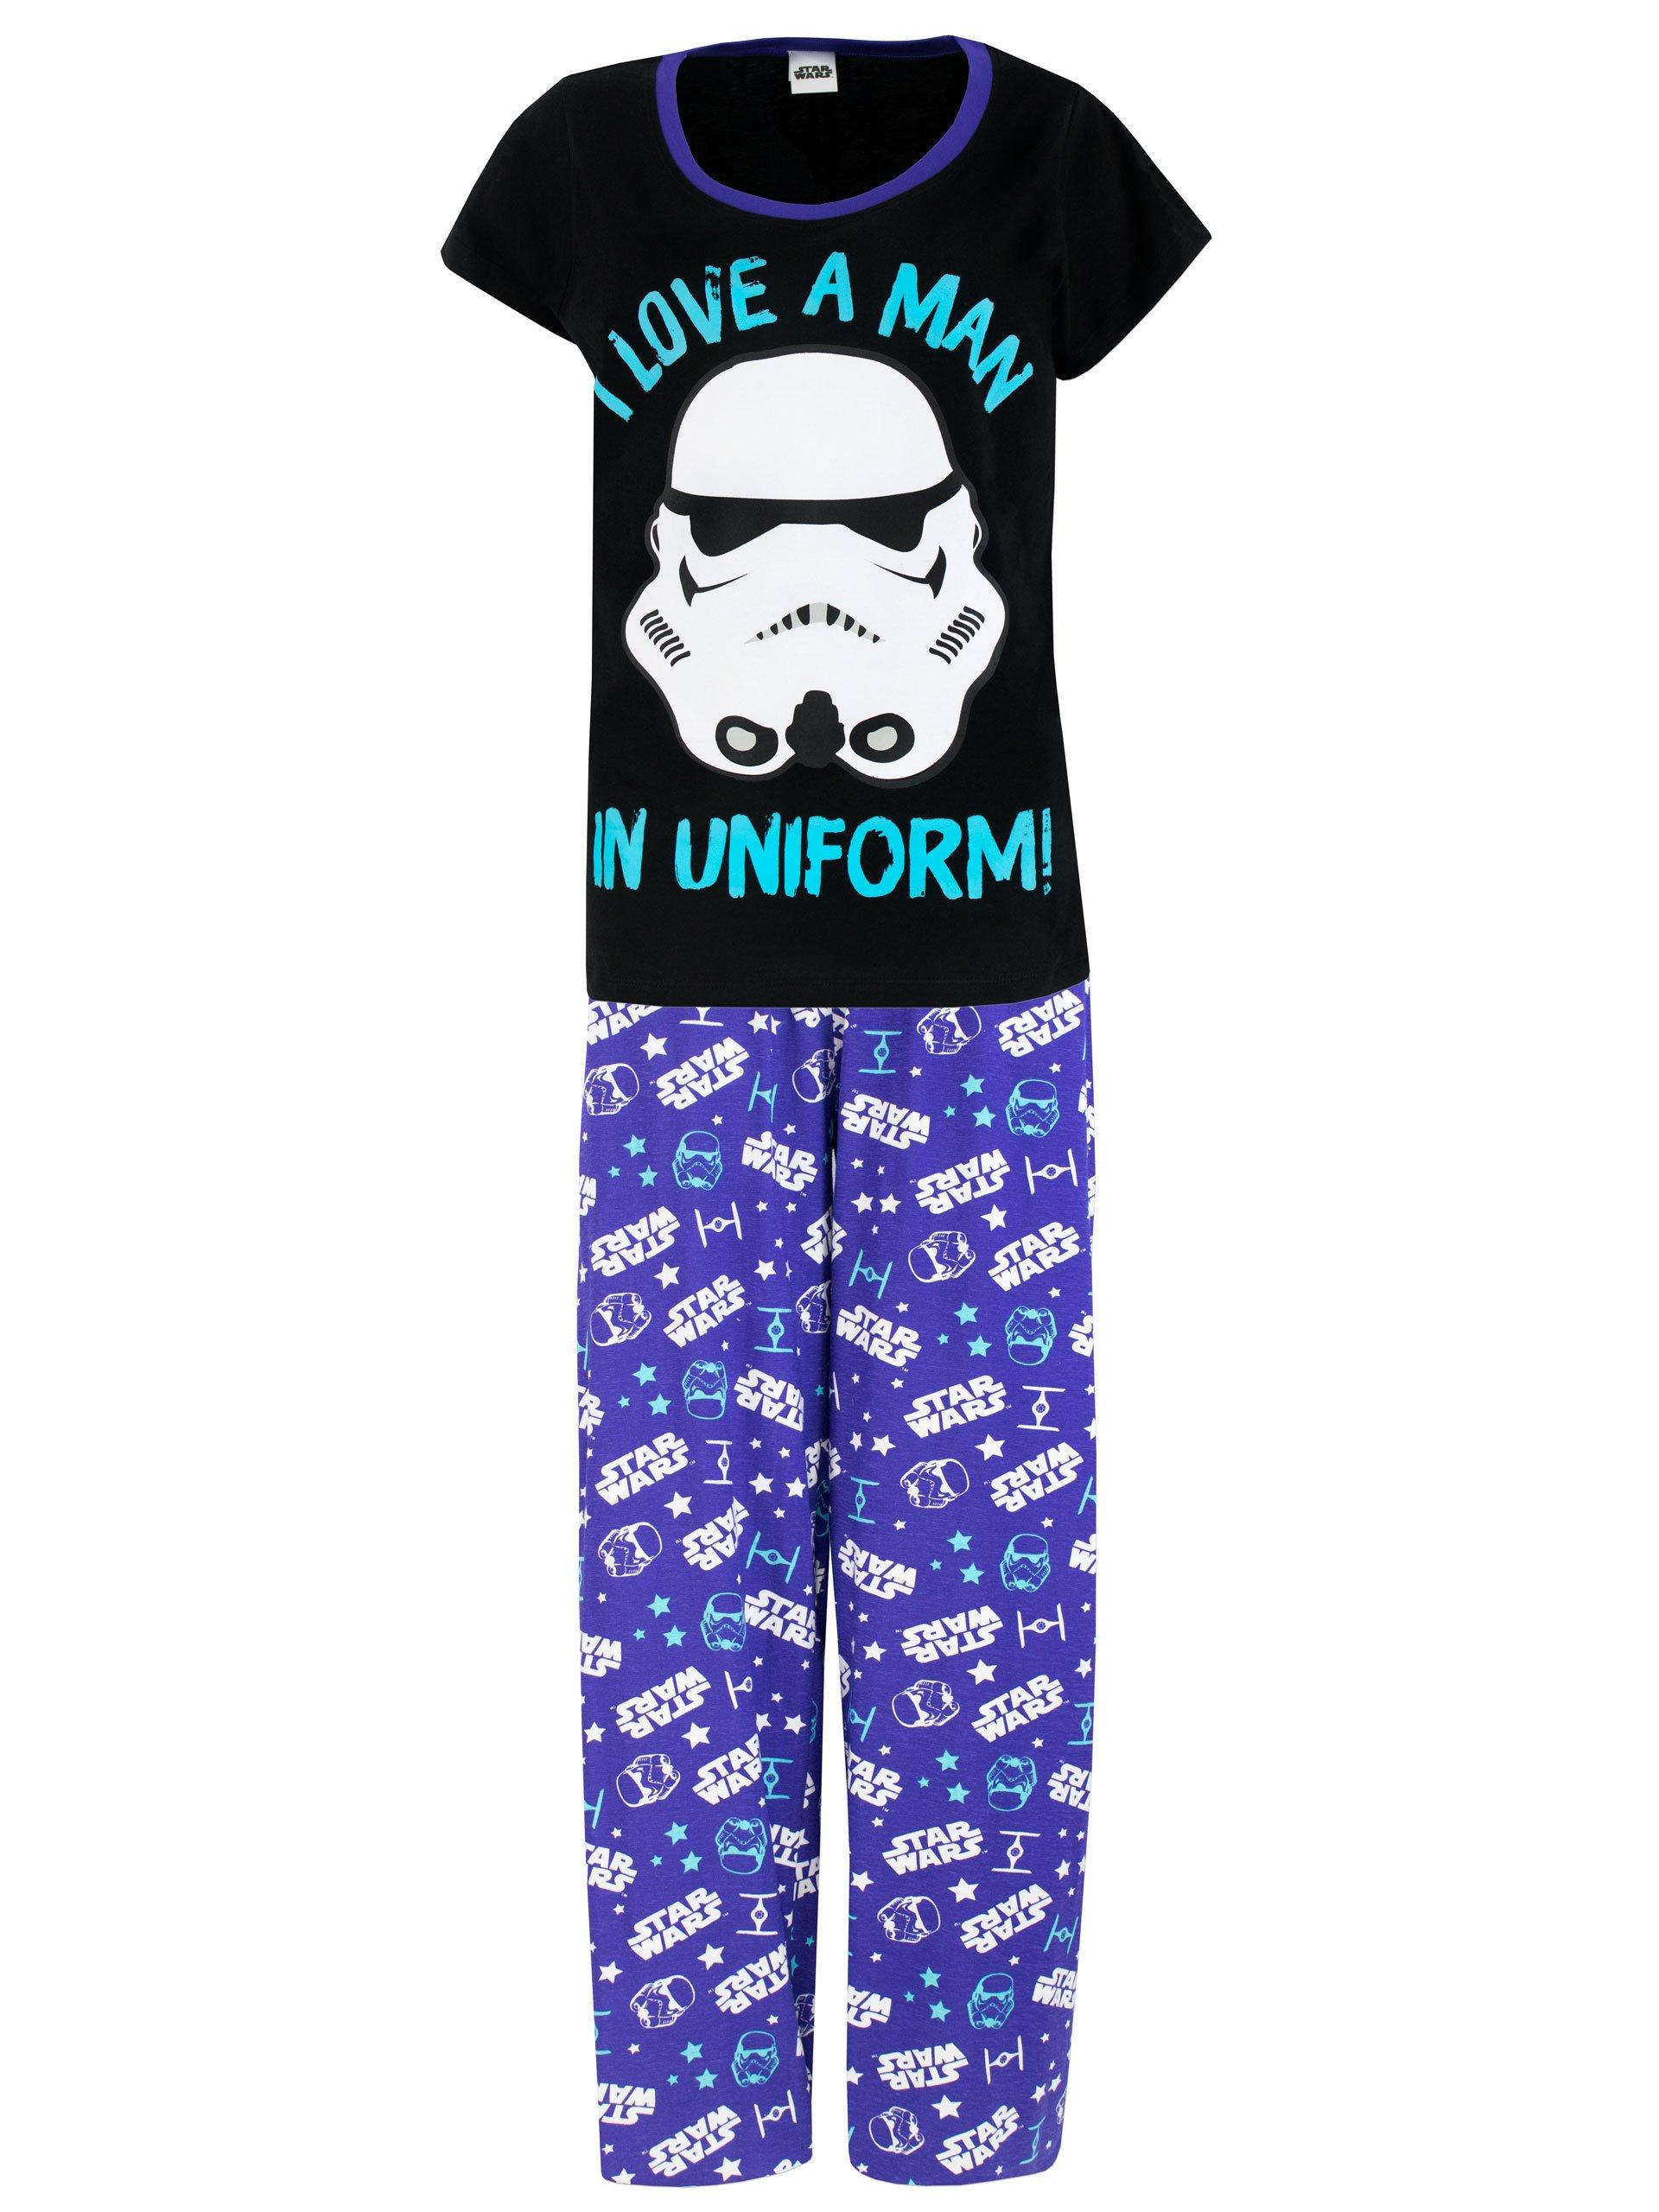 Star Wars - Pijama para mujer - Stromtrooper product image